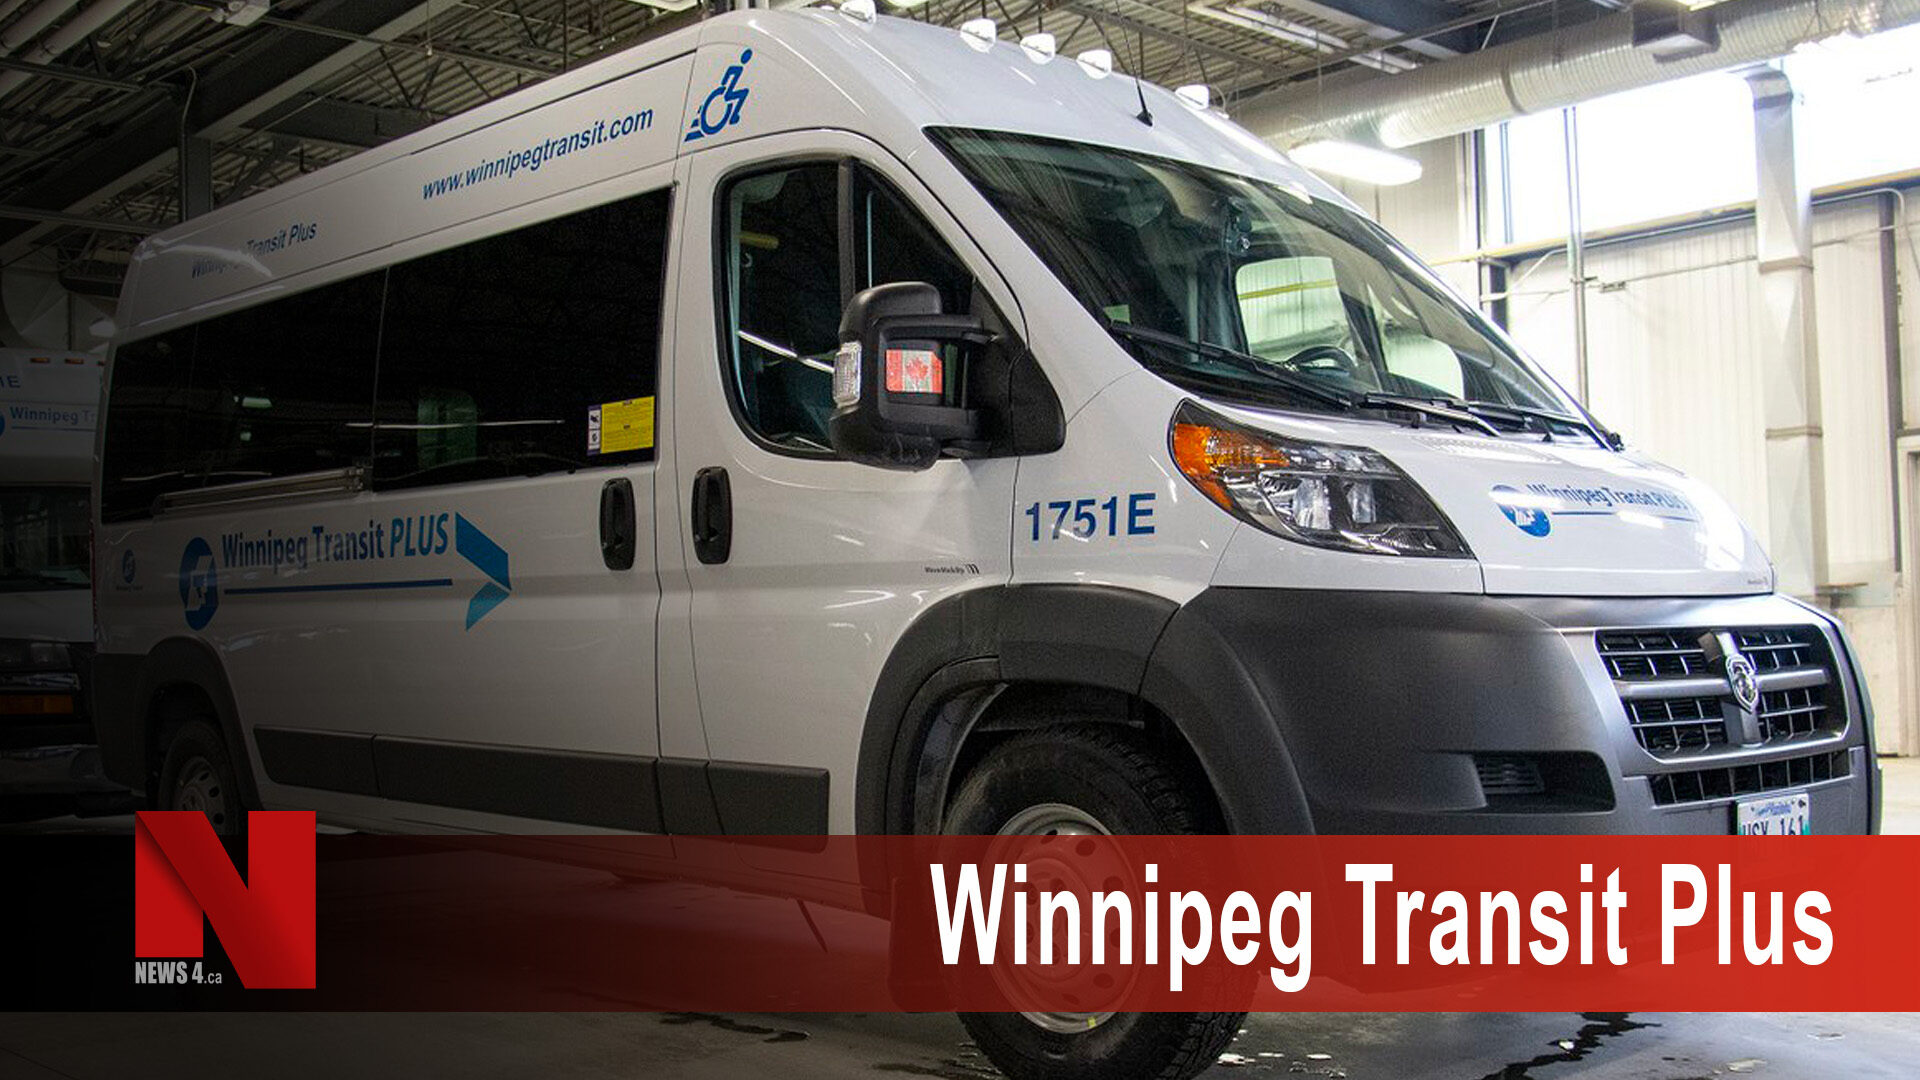 Winnipeg Transit Plus